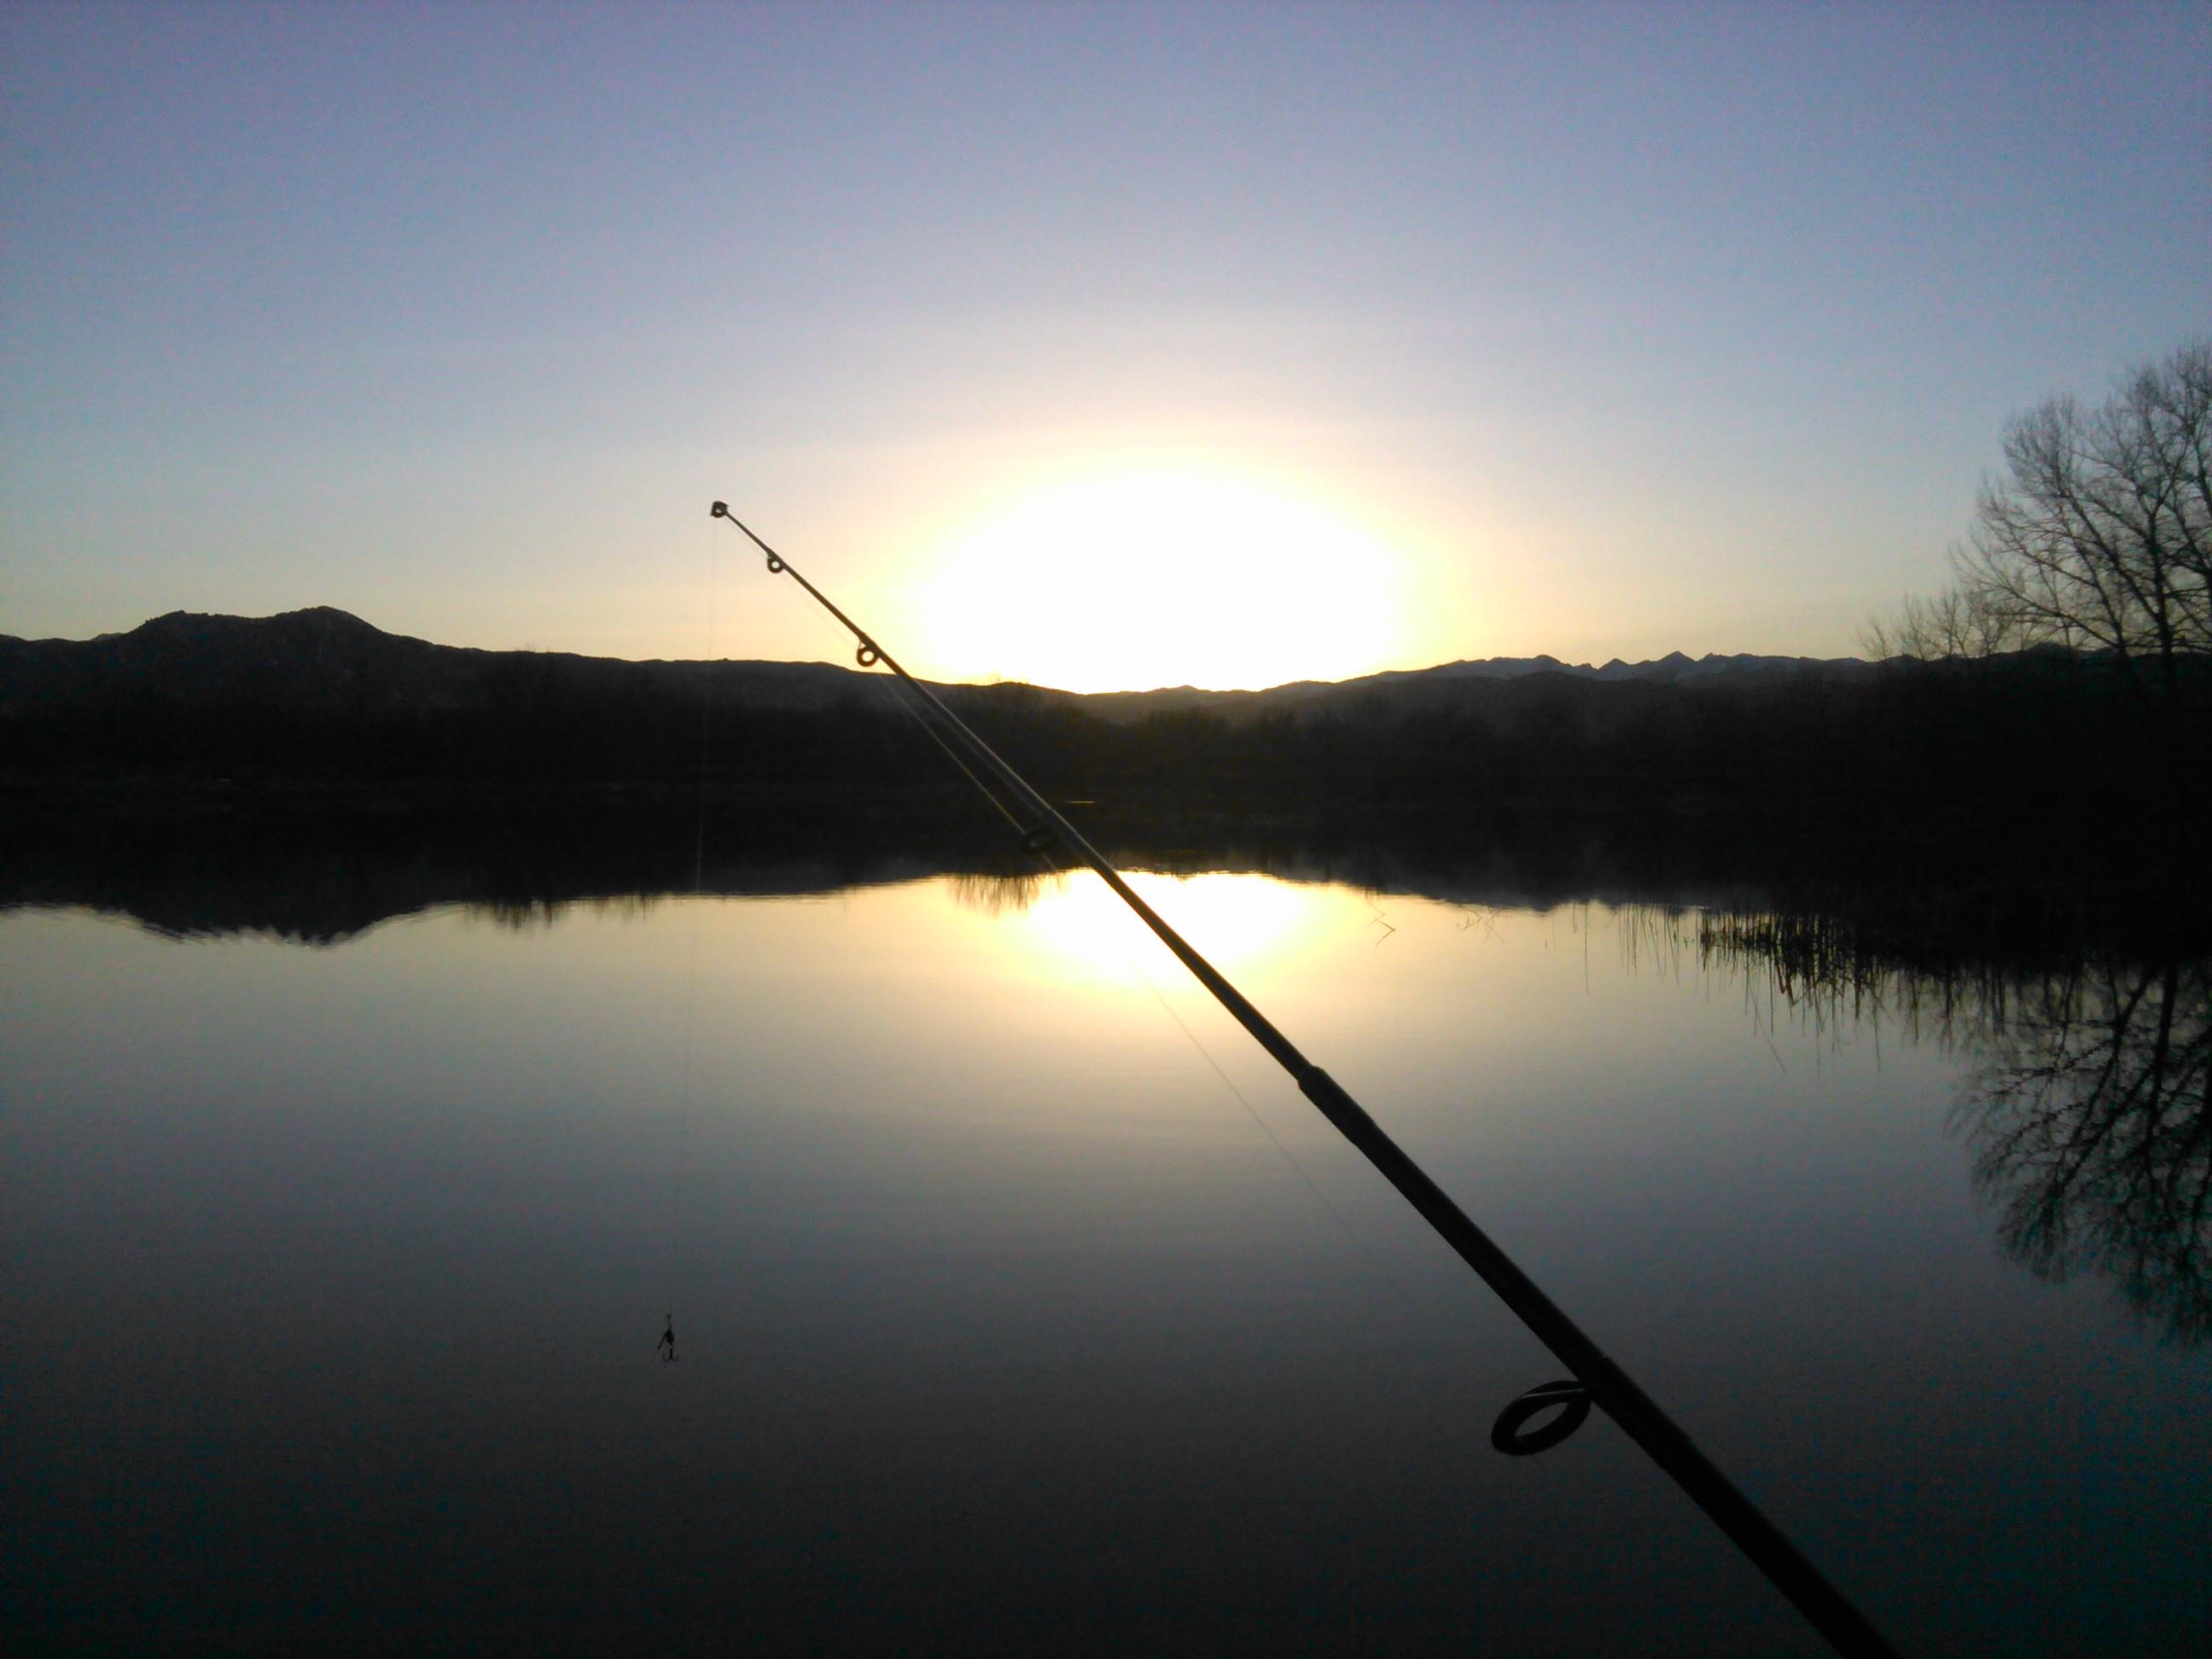 fishing-pole-walden-sawhill-ponds